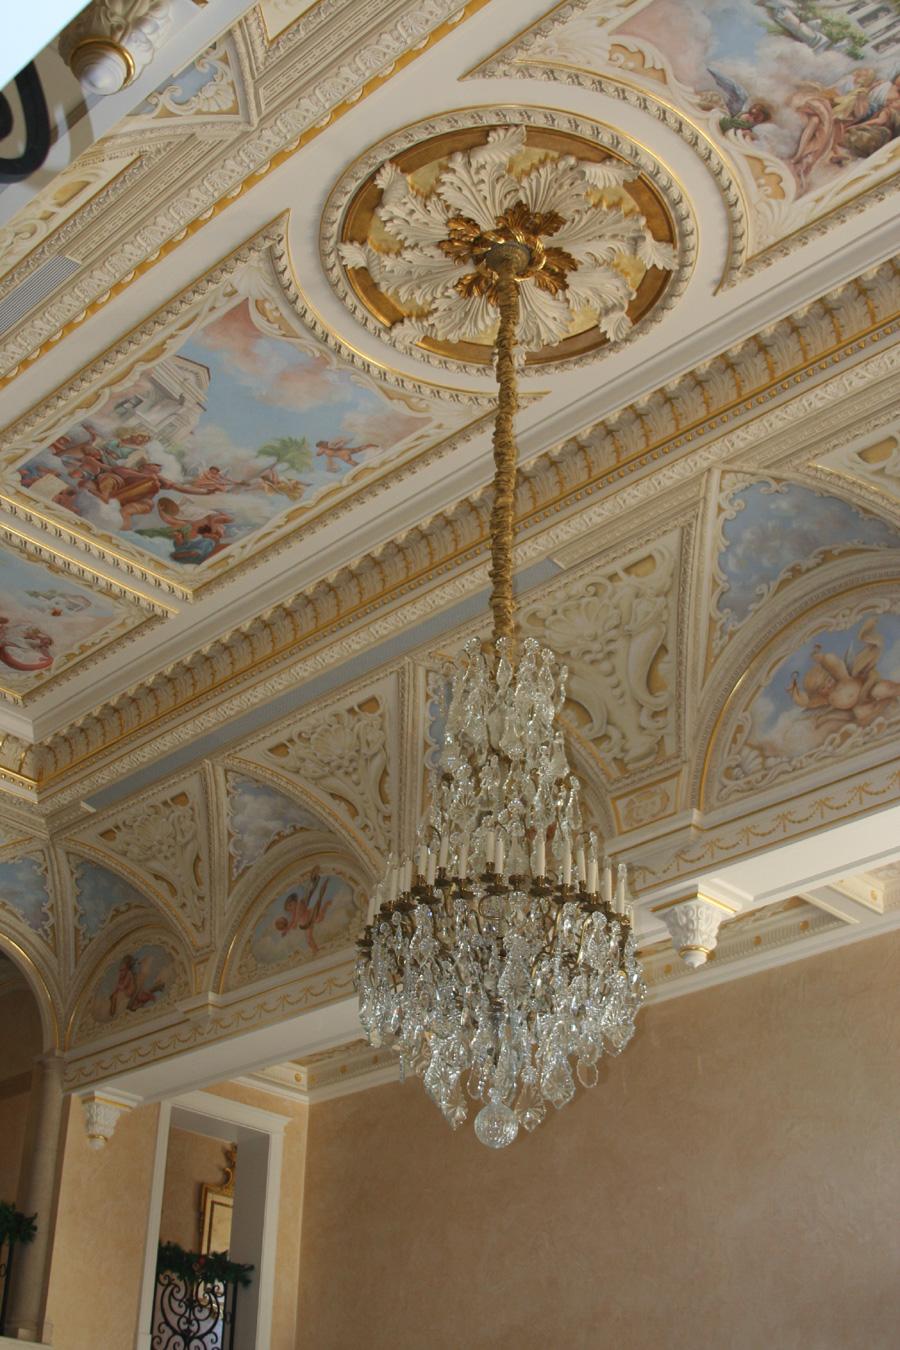 Venetian Plaster Walls Tromp L Oeil Murals 24k Gold Leaf Glazed Moldings